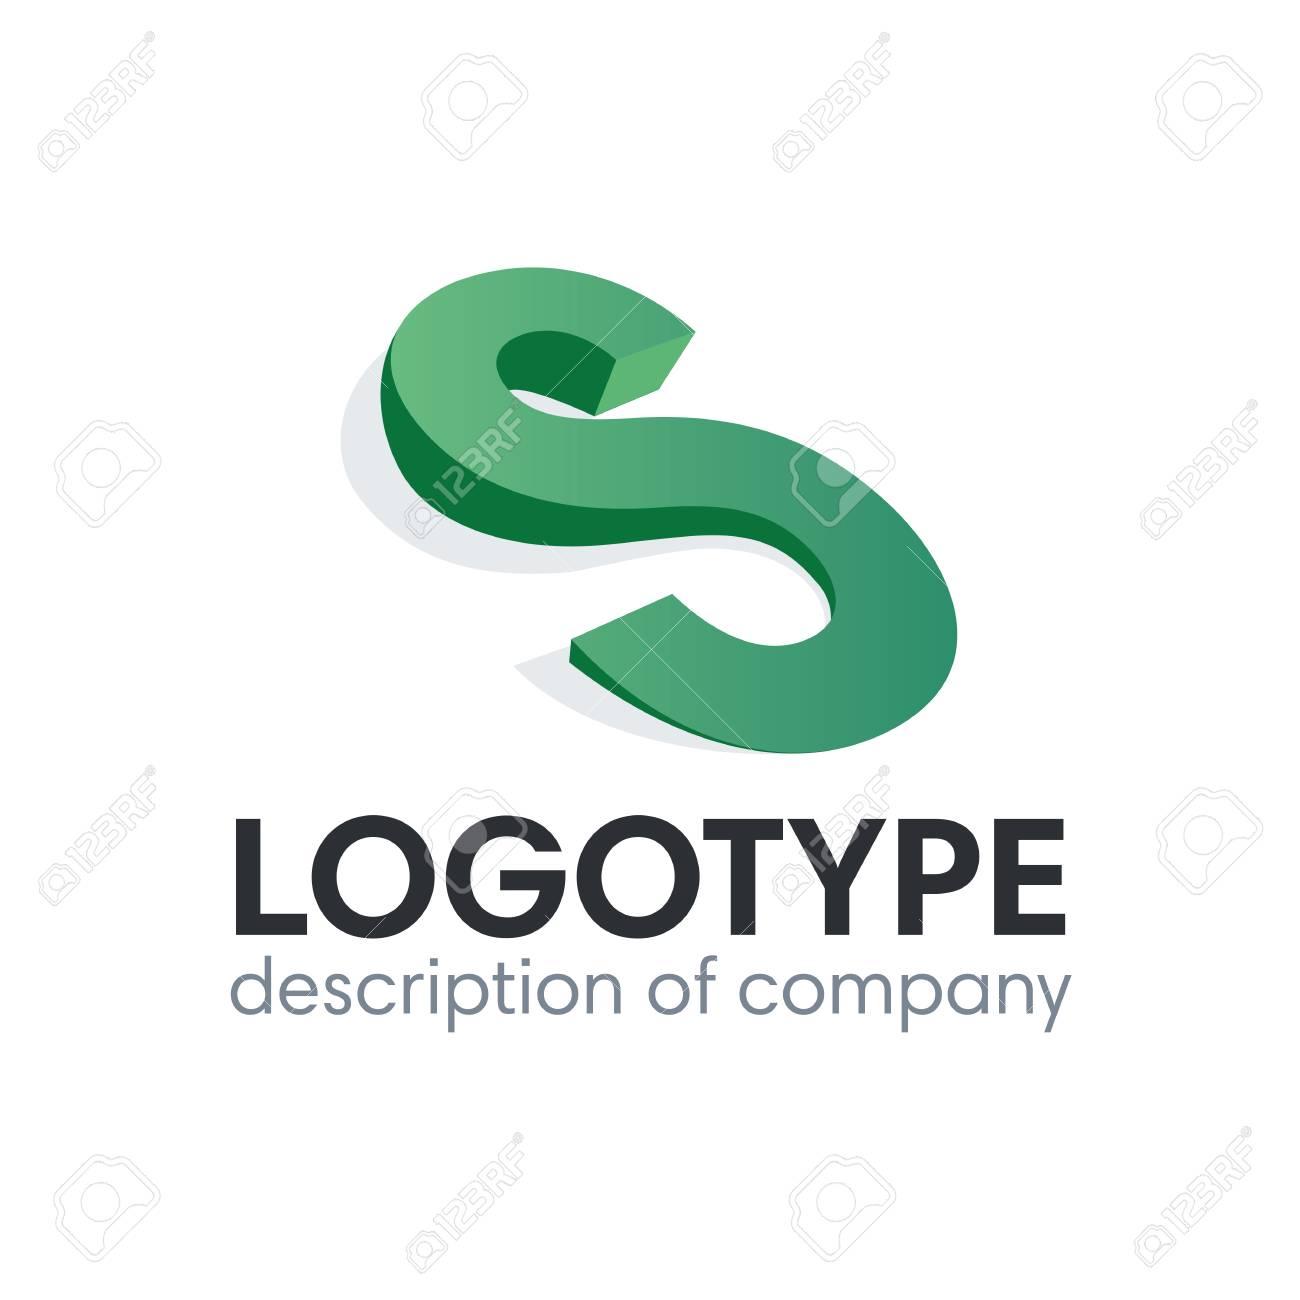 Letter S logo icon design template elements - 84049340